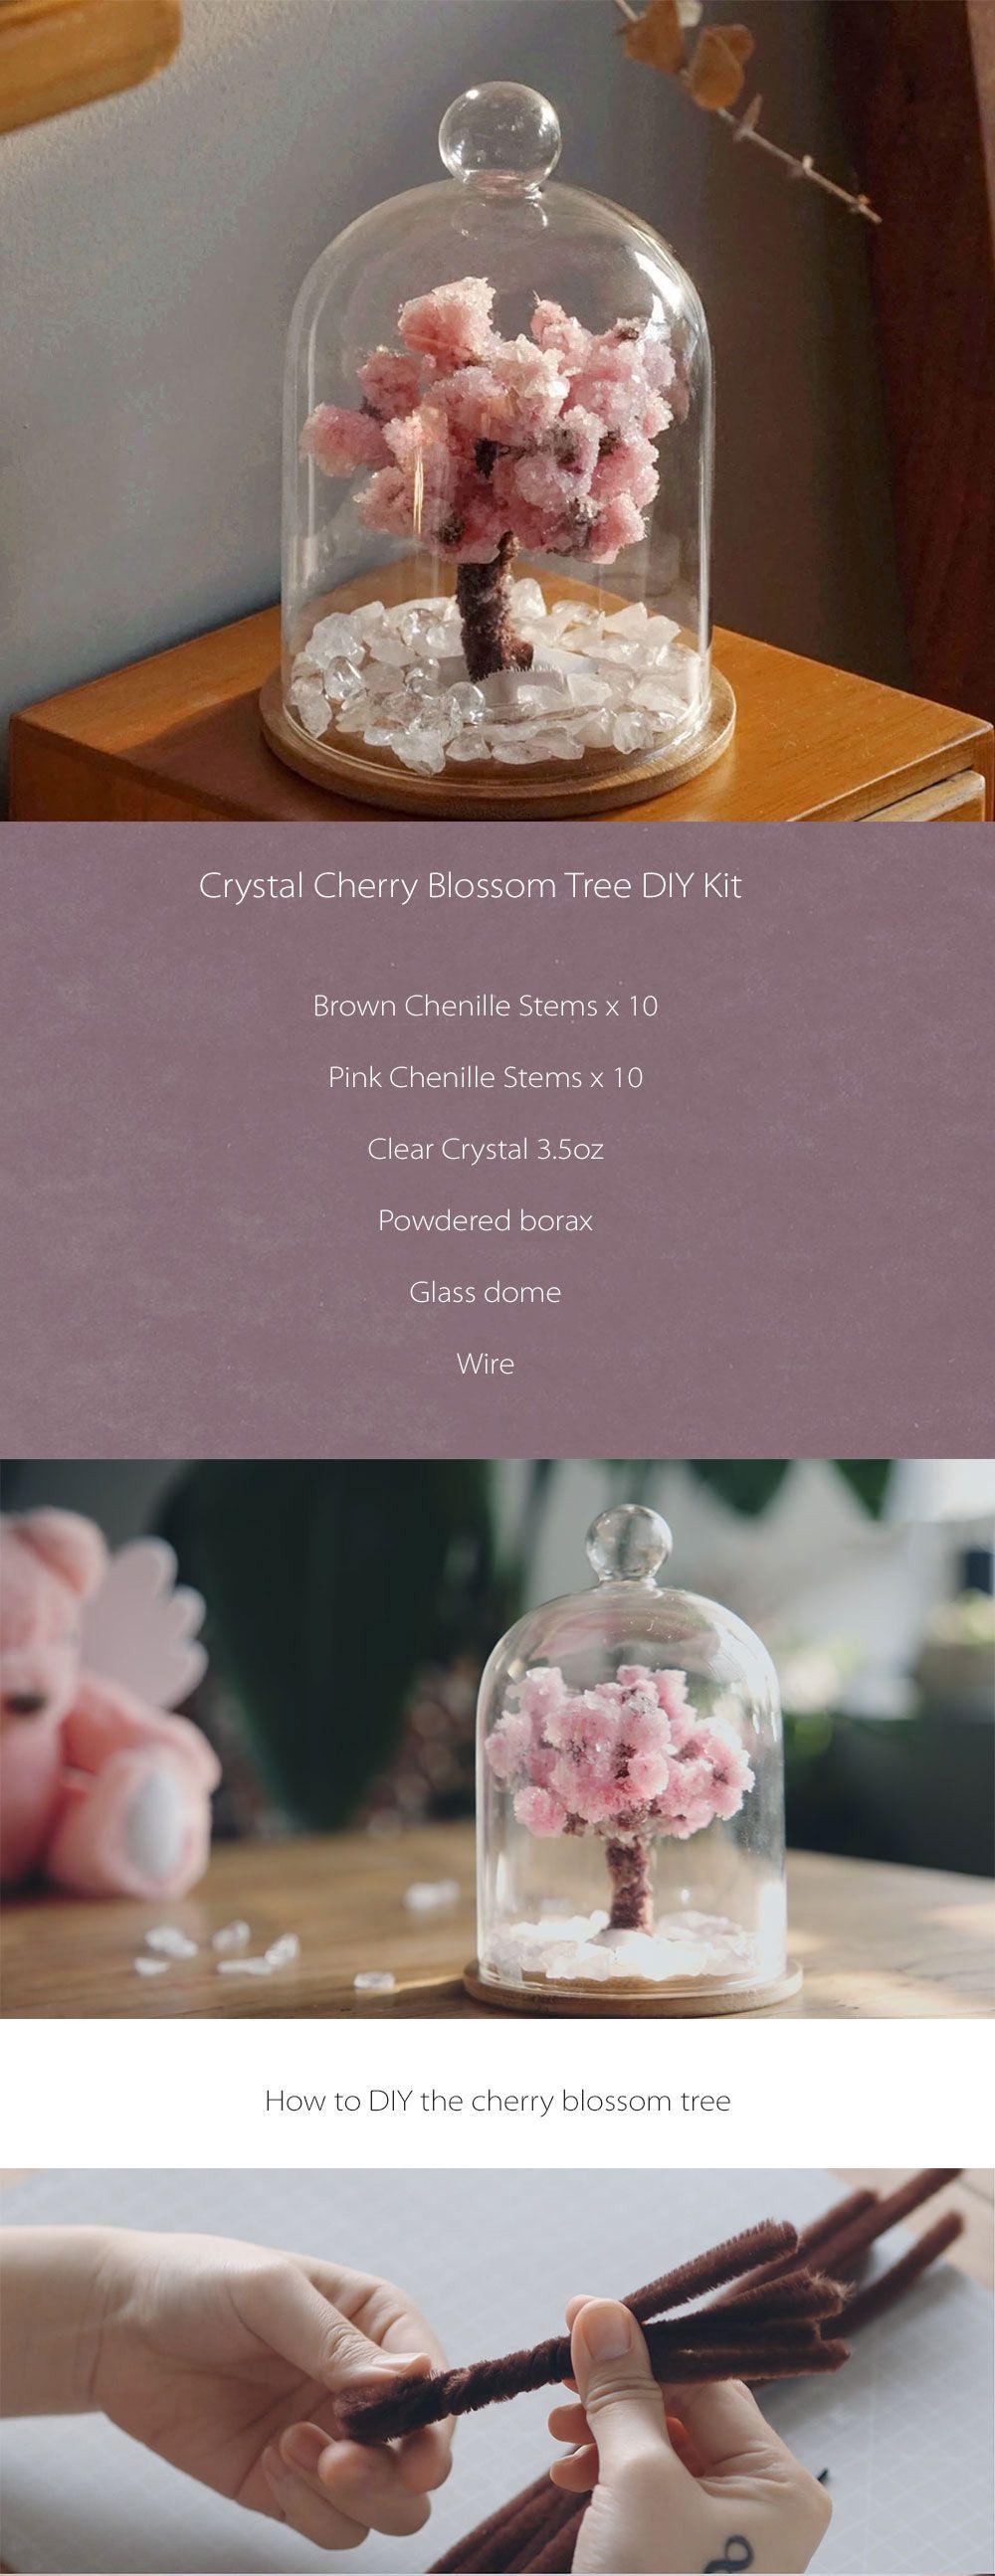 Crystal Cherry Blossom Tree Diy Kit Bring The Cherry Blossom Tree Into Your Room Cherry Blossom Tree Diy Kits Diy Crystals